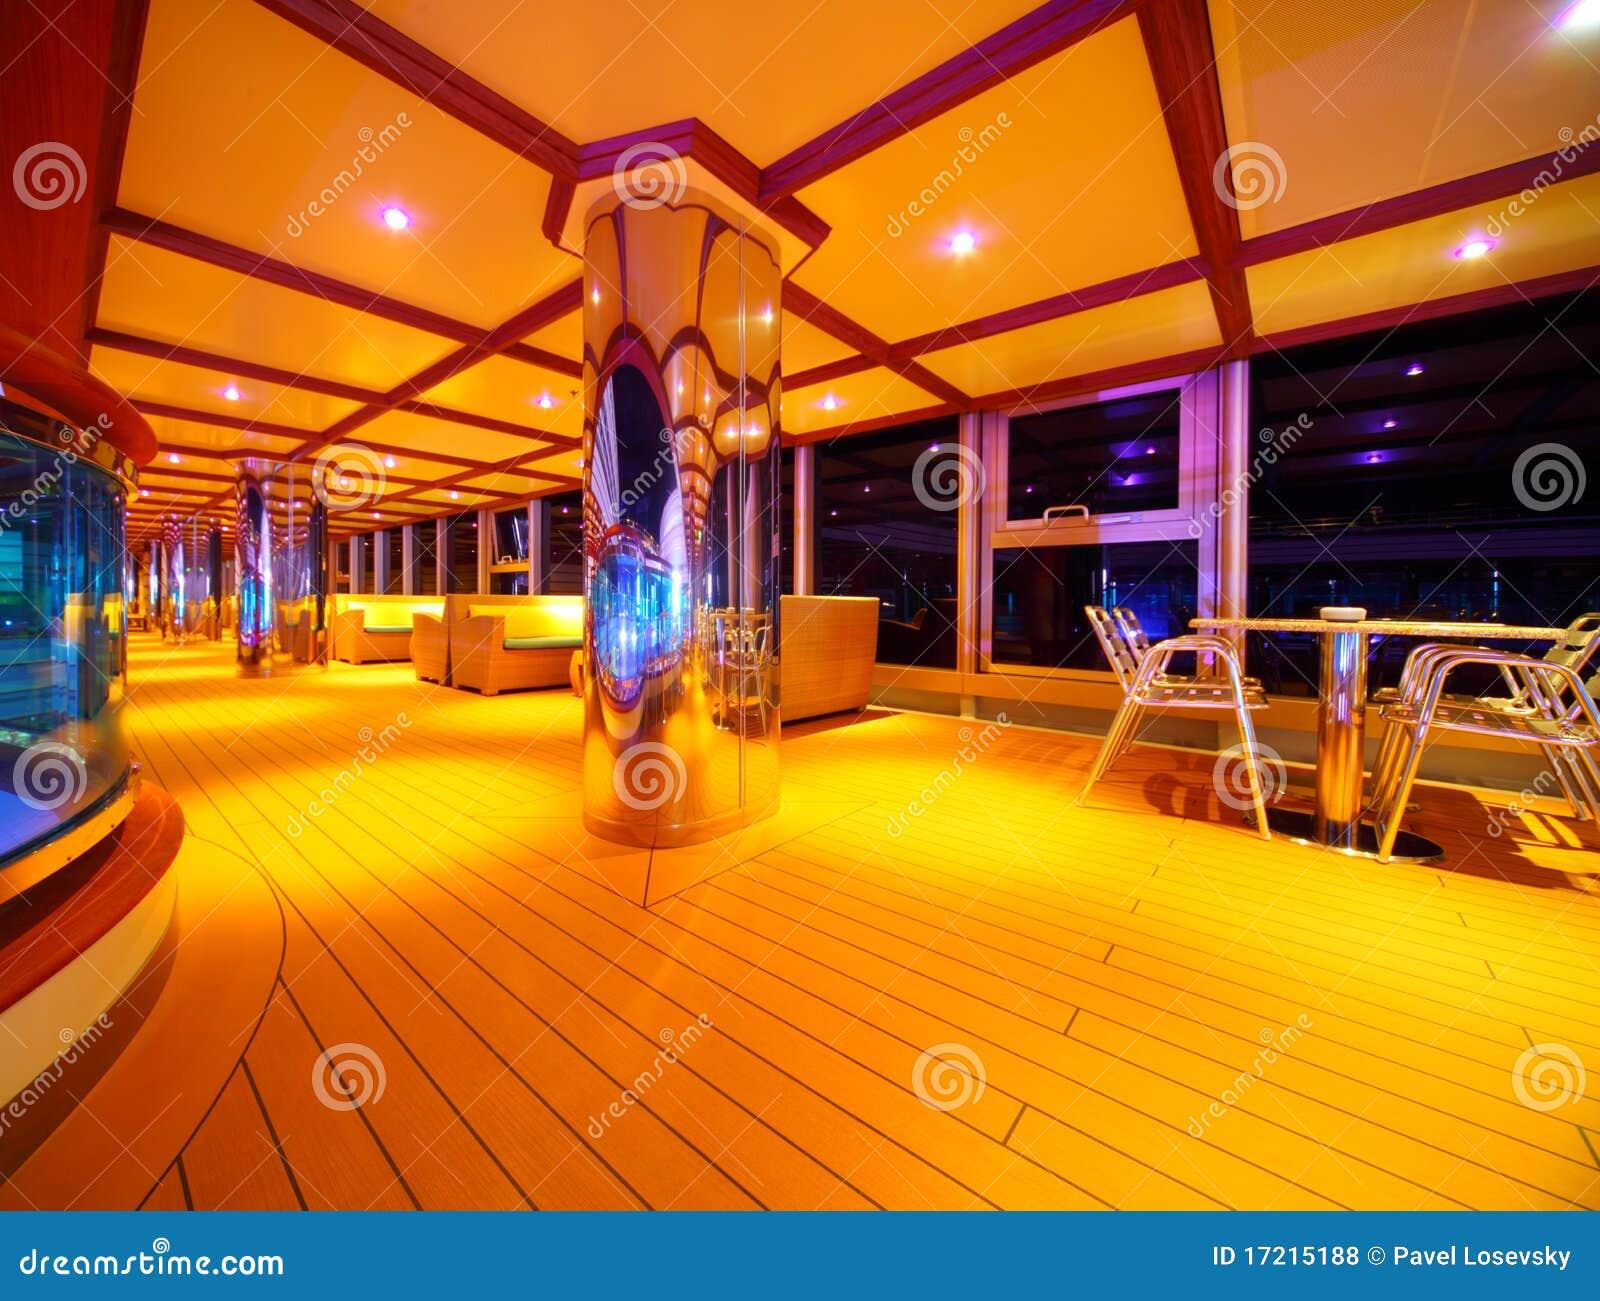 Interior Of Illuminated Restaurant On Cruise Ship Stock  : interior illuminated restaurant cruise ship 17215188 from cartoondealer.com size 1300 x 1074 jpeg 222kB